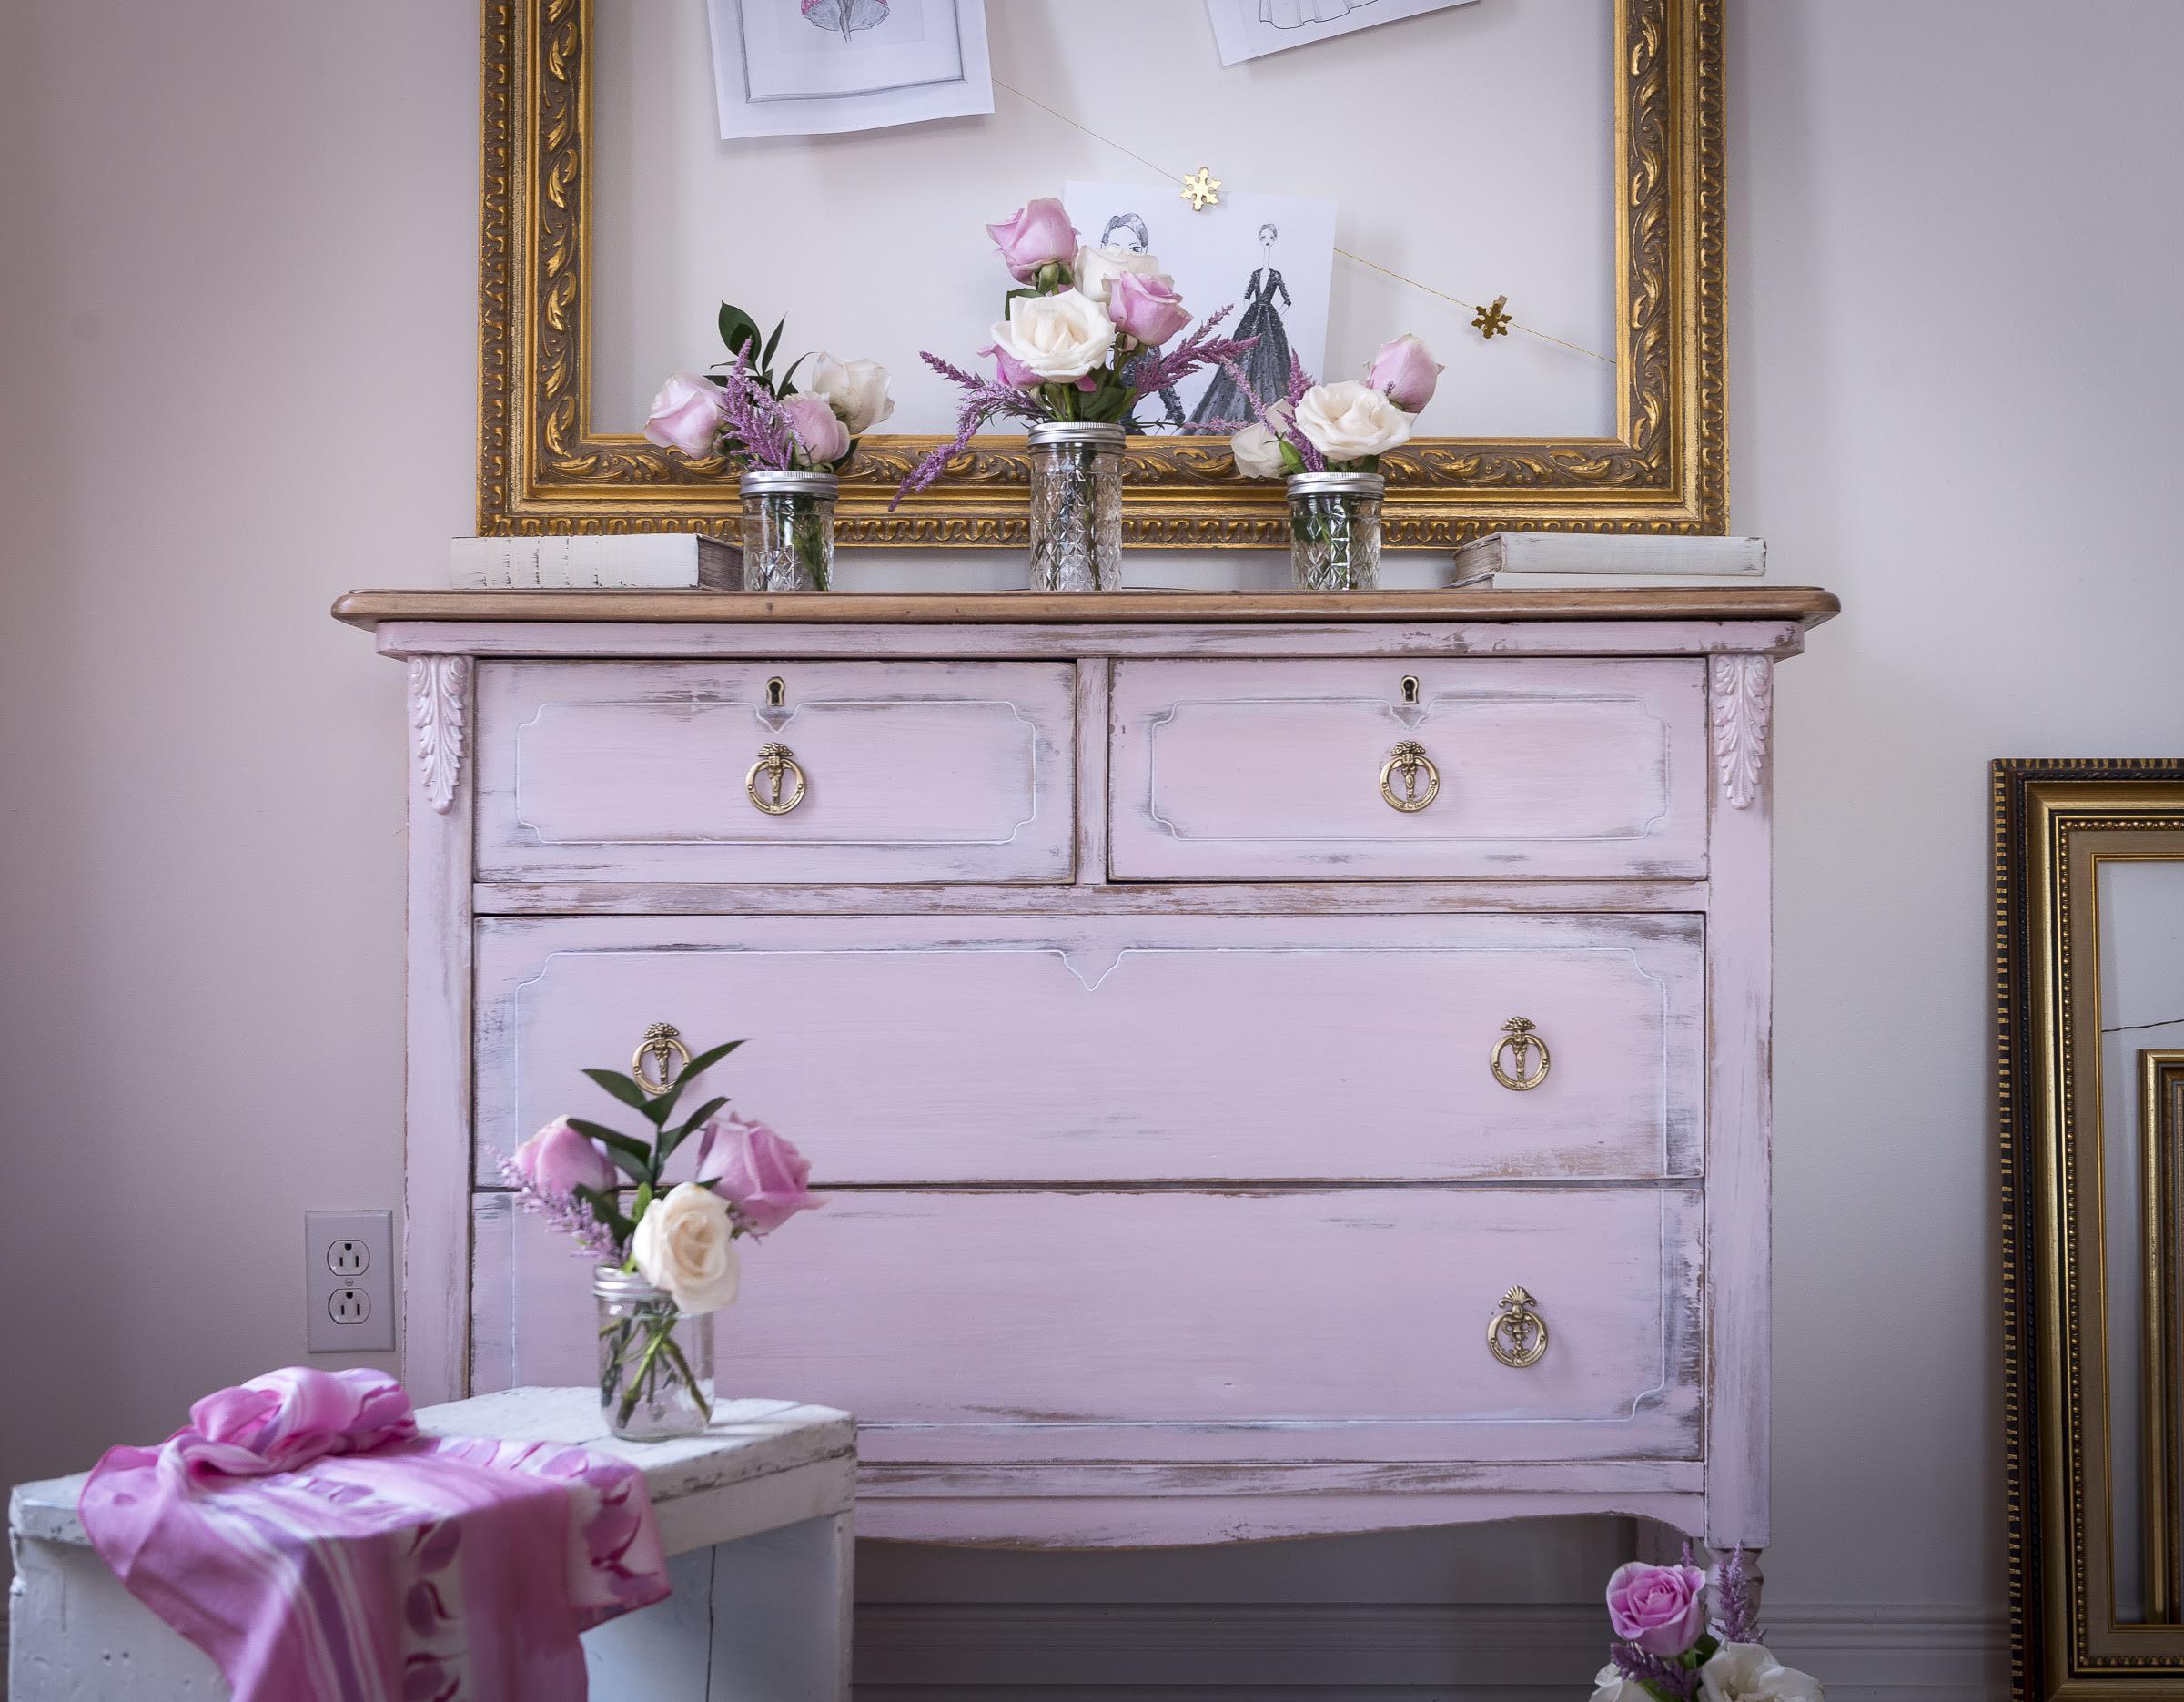 Erin_Mills_Paint_Vintage_Cupcake_-_Mary_Vitullo3_fc828209-b01f-48f6-a524-10668d48c5cb.jpg